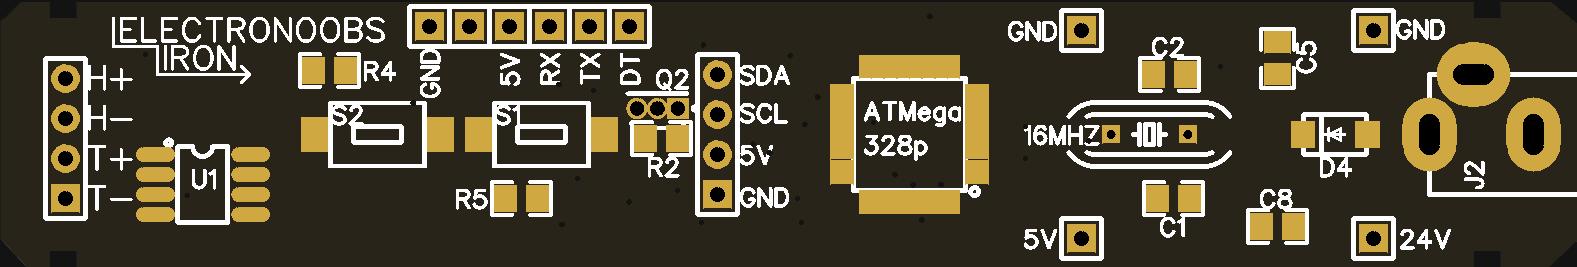 Arduino based portable soldering iron board